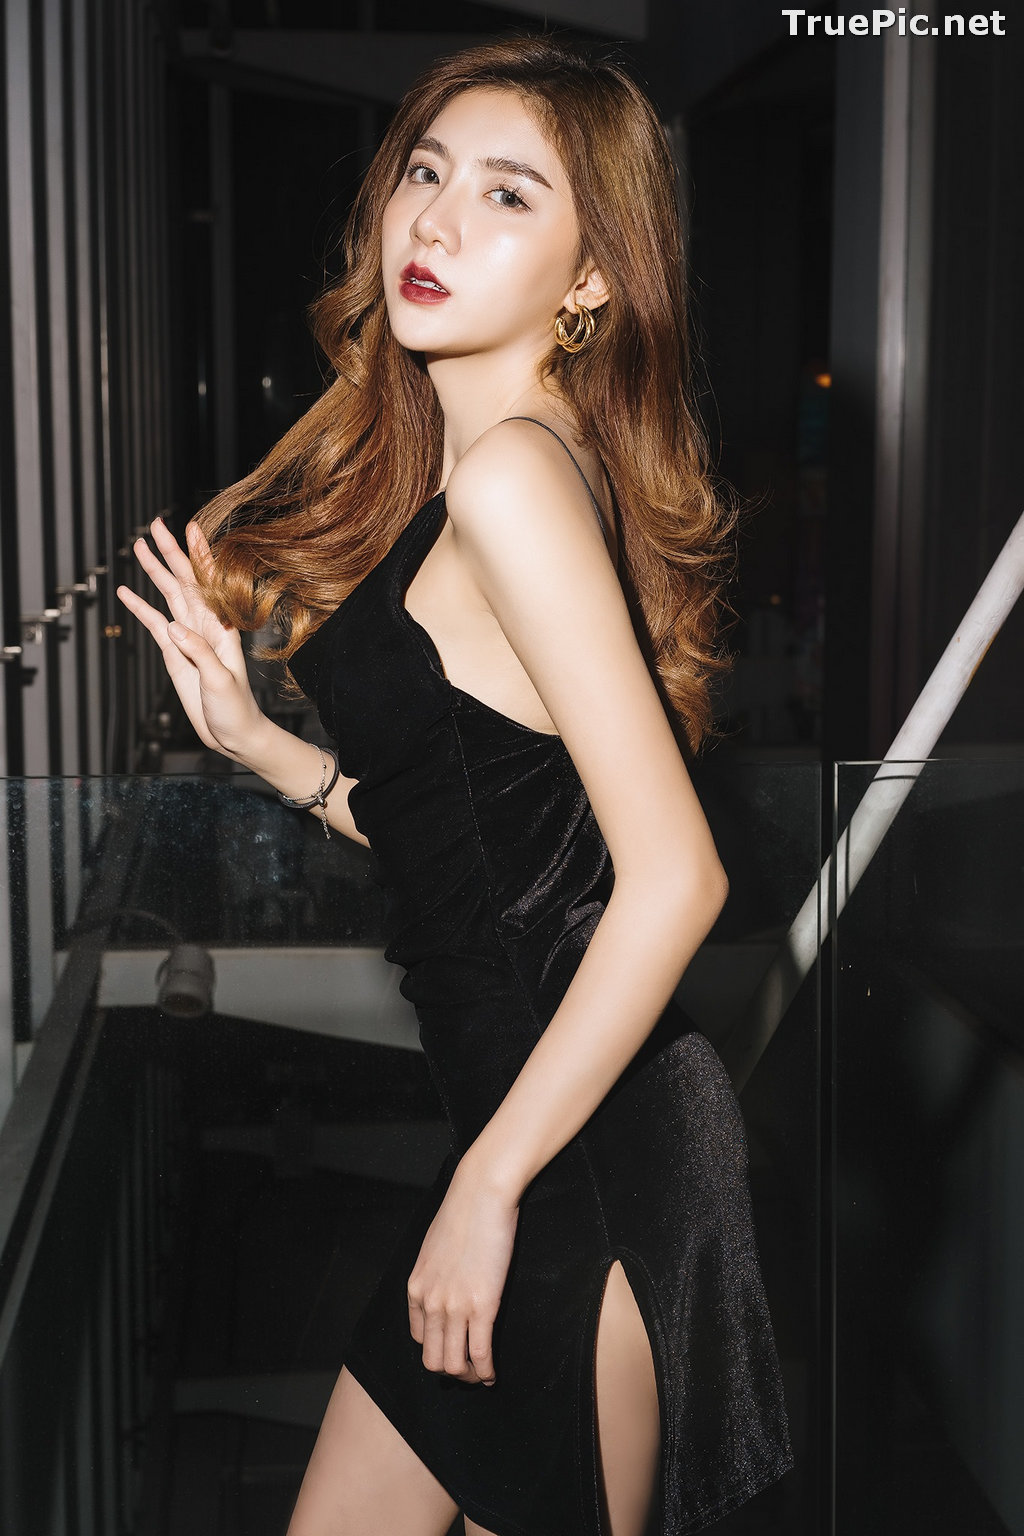 Image Thailand Model - Sasi Ngiunwan - Black For SiamNight - TruePic.net - Picture-35